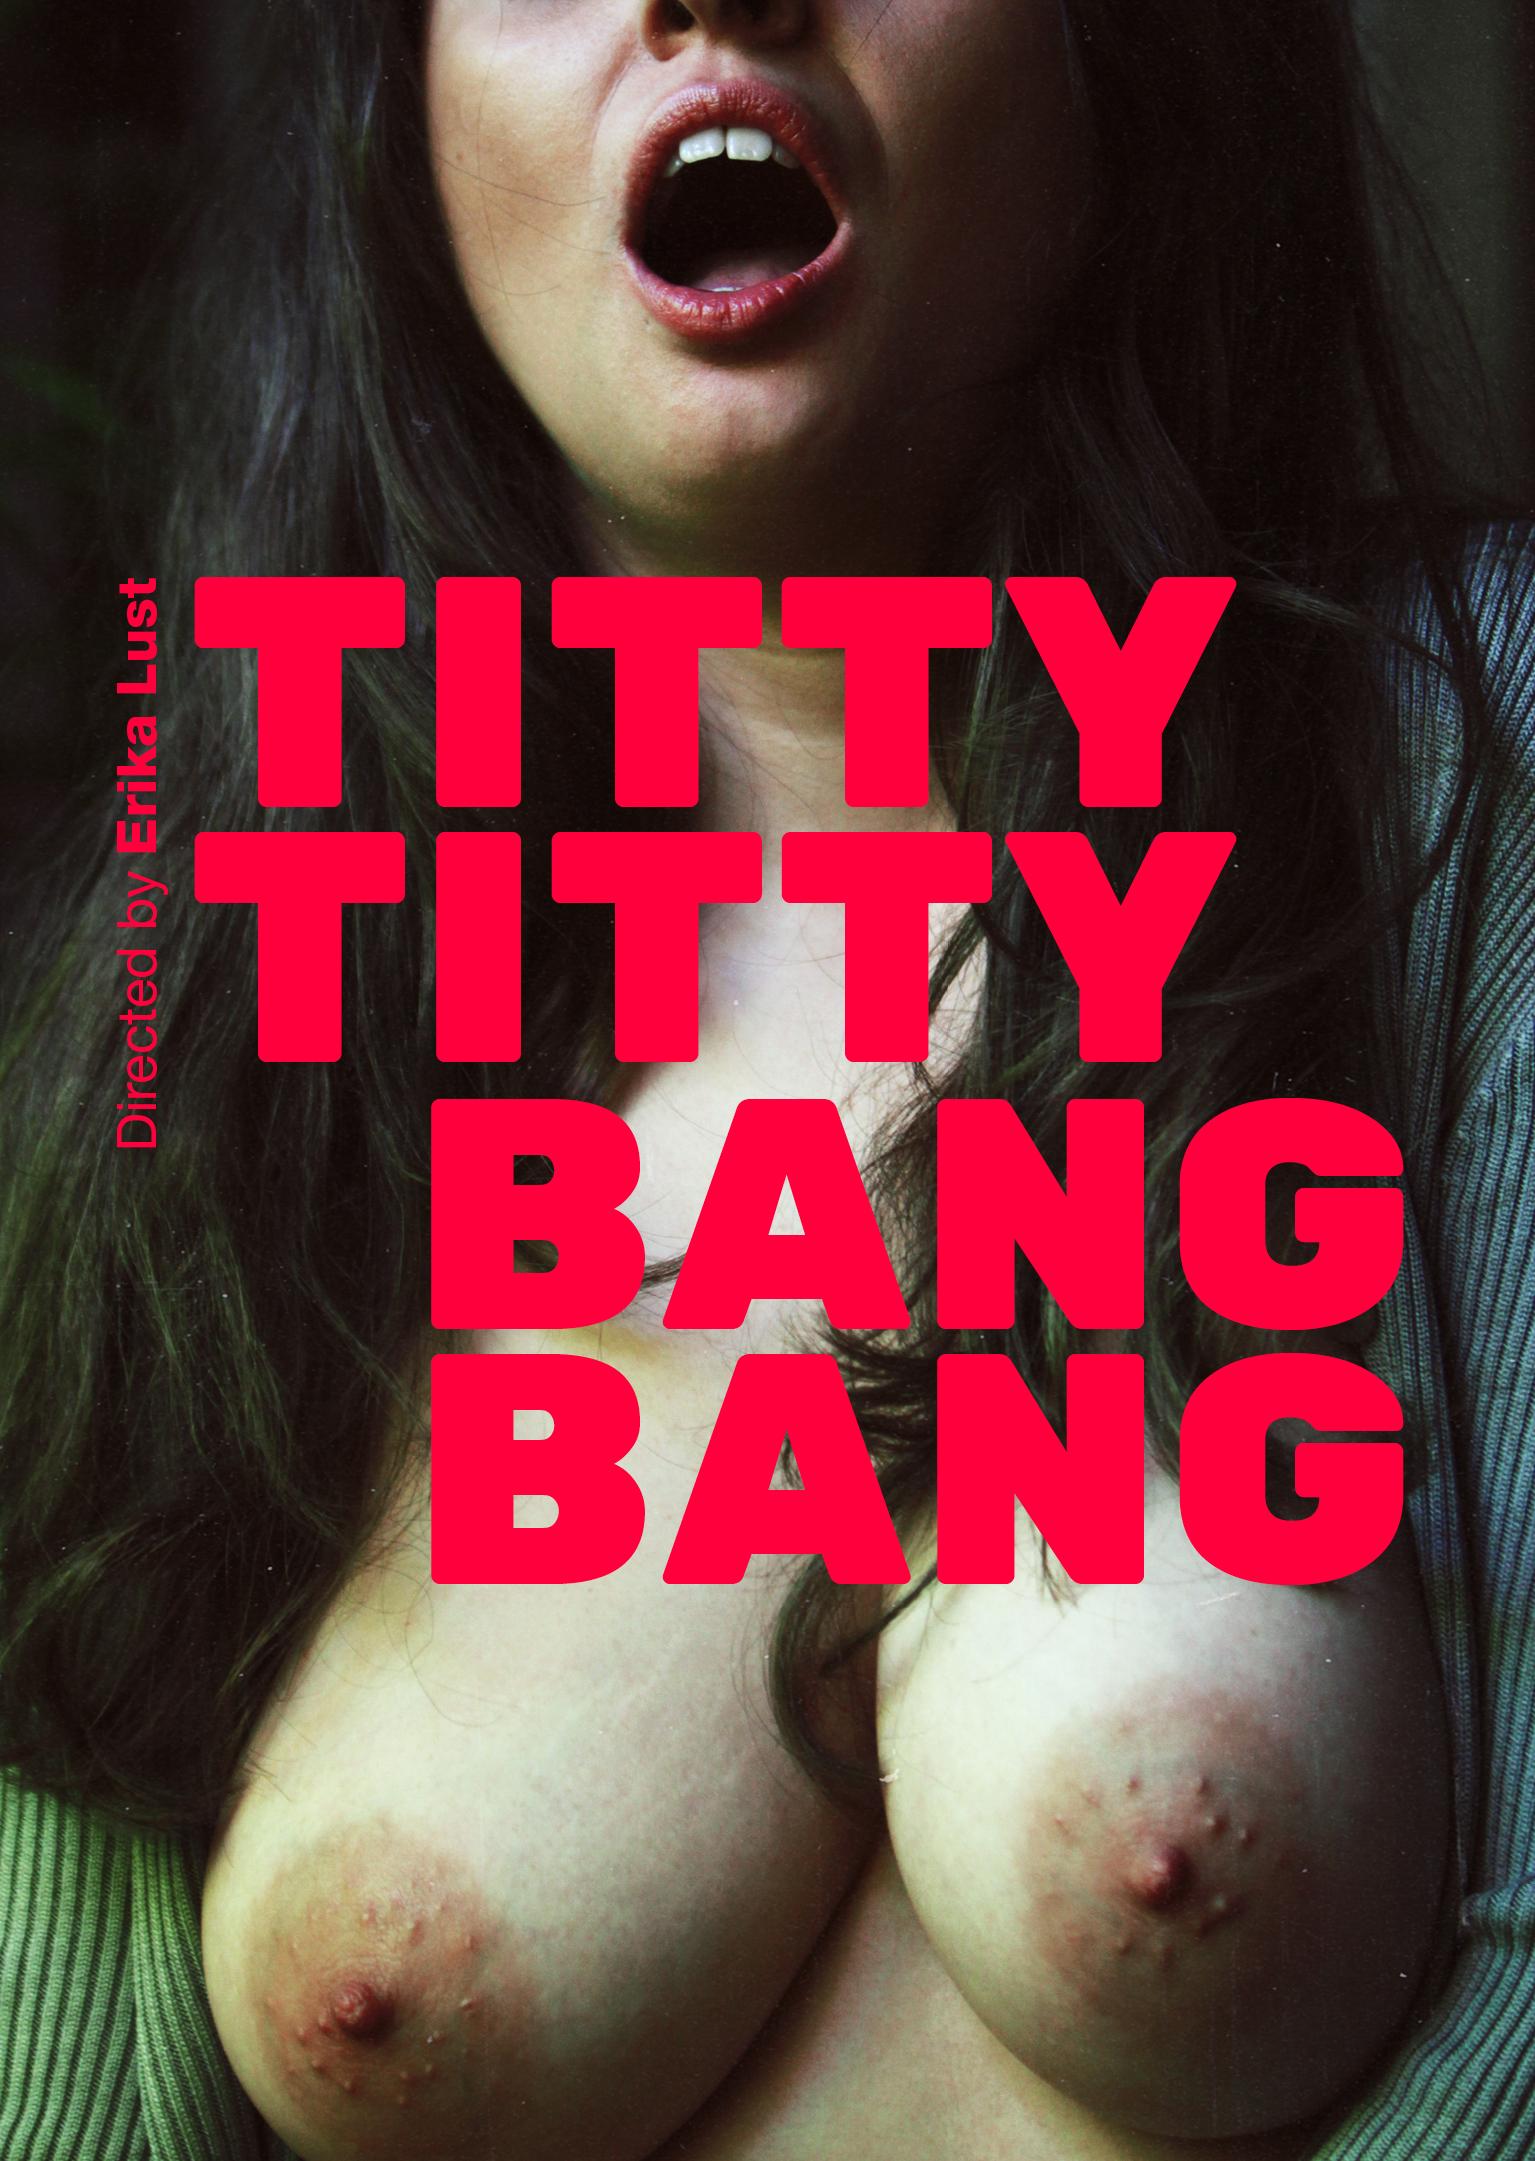 Titty Titty Bang Bang Xconfessions Erika Lust